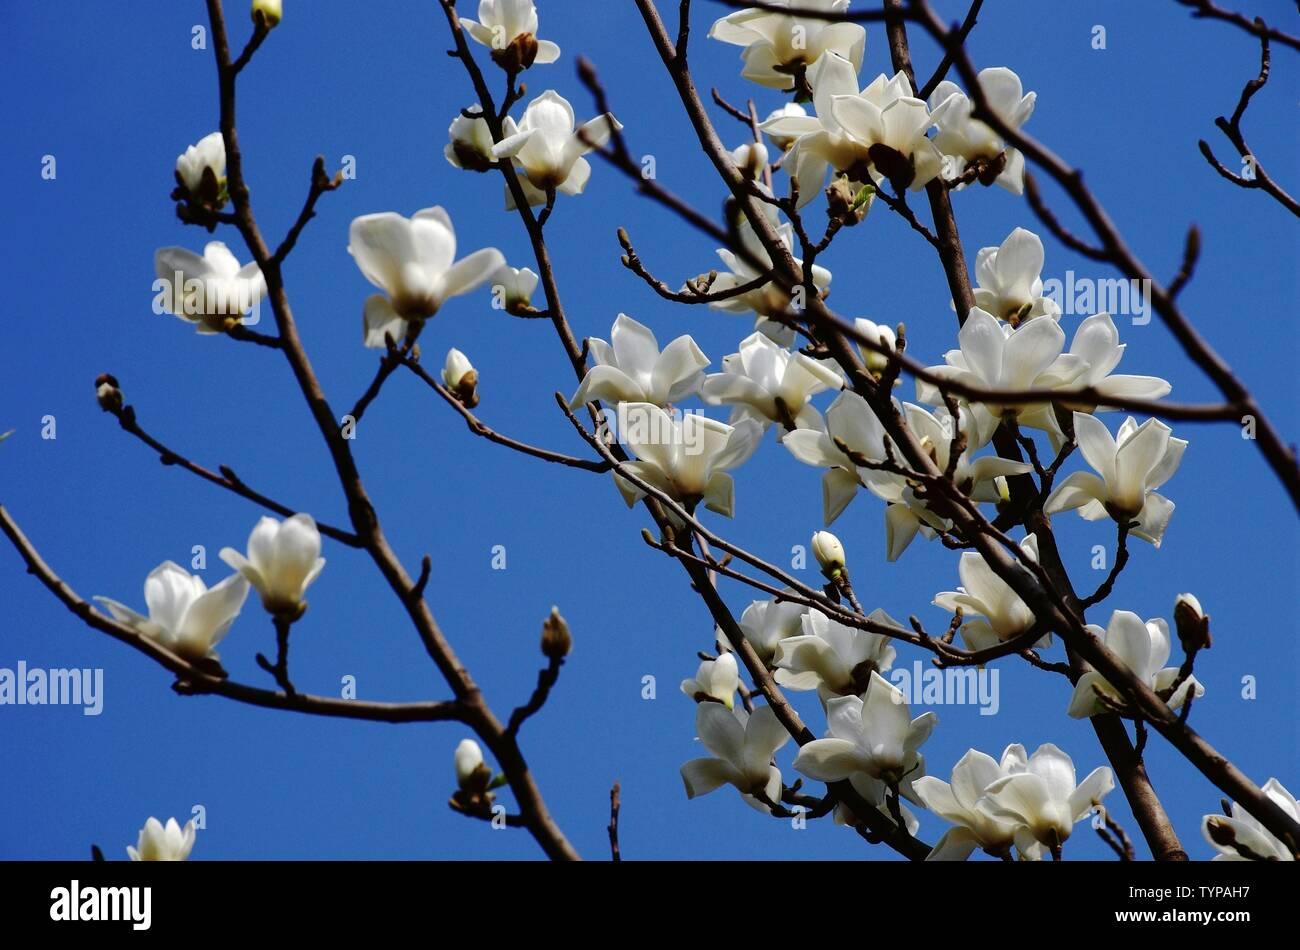 Magnolia magnolia flower Stock Photo